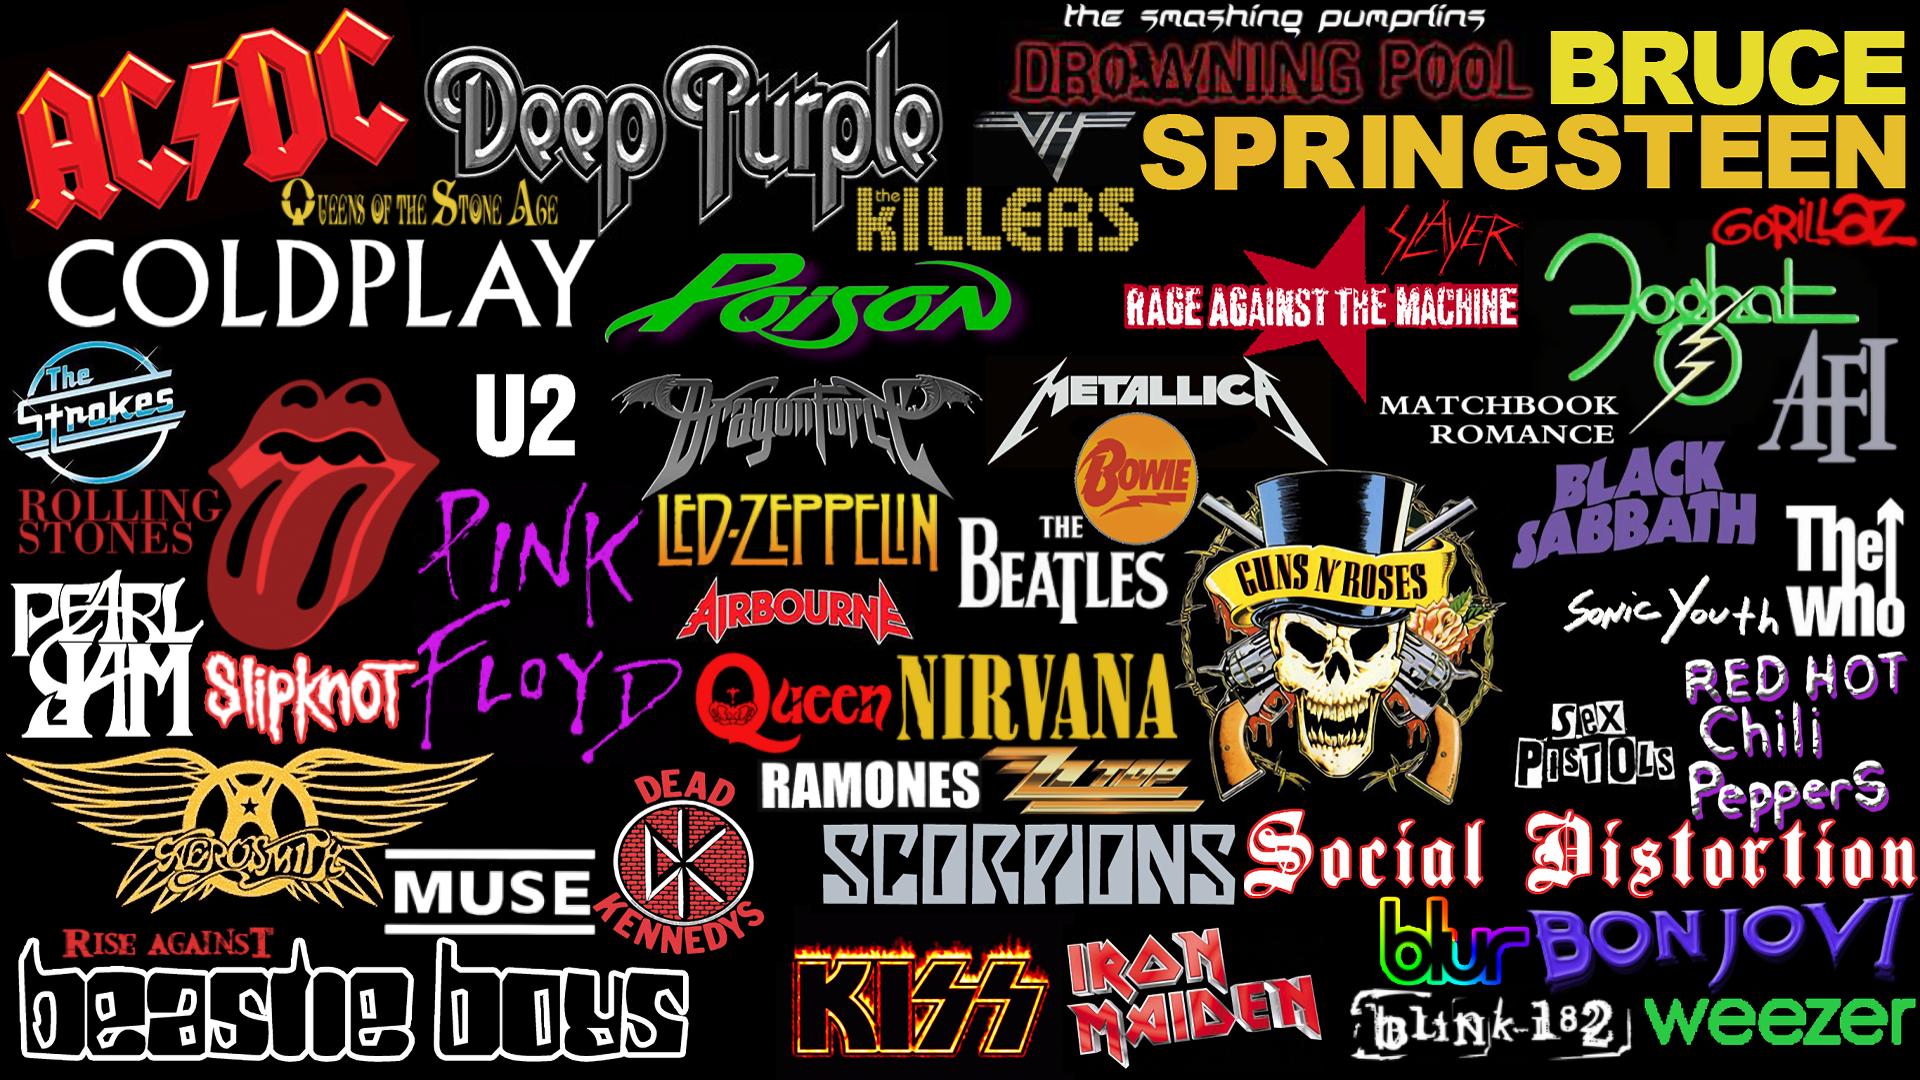 Обои на телефон логотипы рок групп душа пред